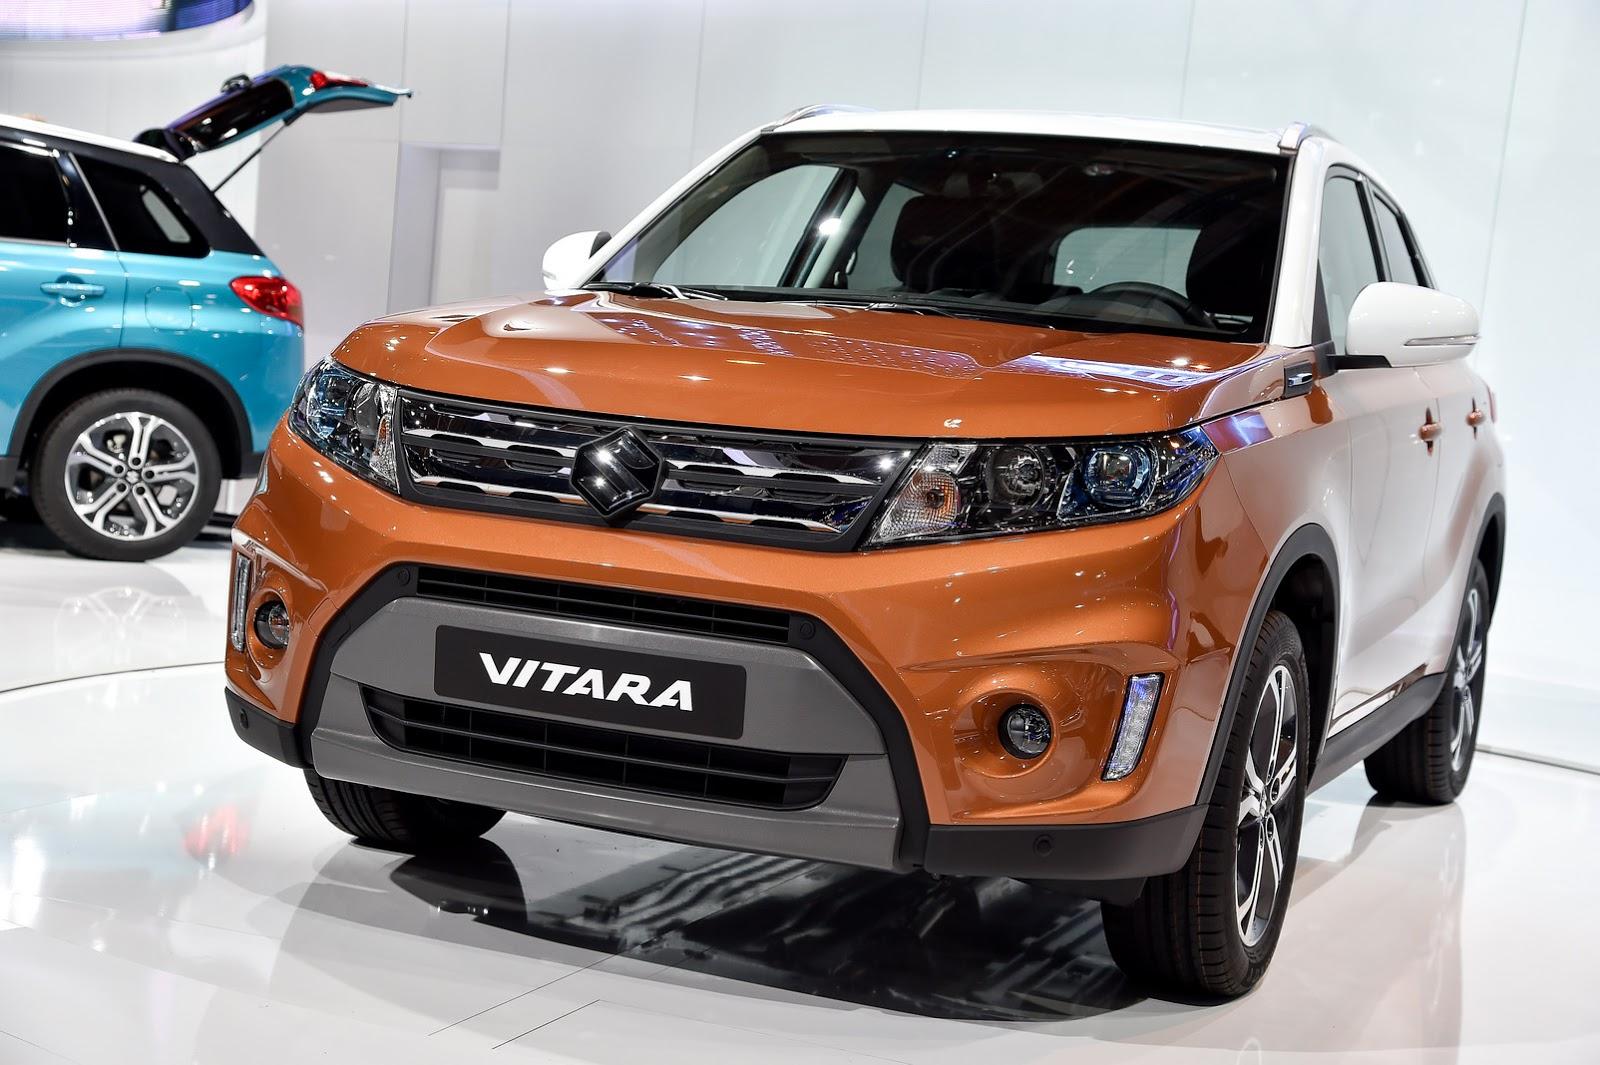 New Suzuki Grand Vitara 2019 >> New Suzuki Vitara Compact SUV Could be Mistaken for a SsangYong… | Carscoops